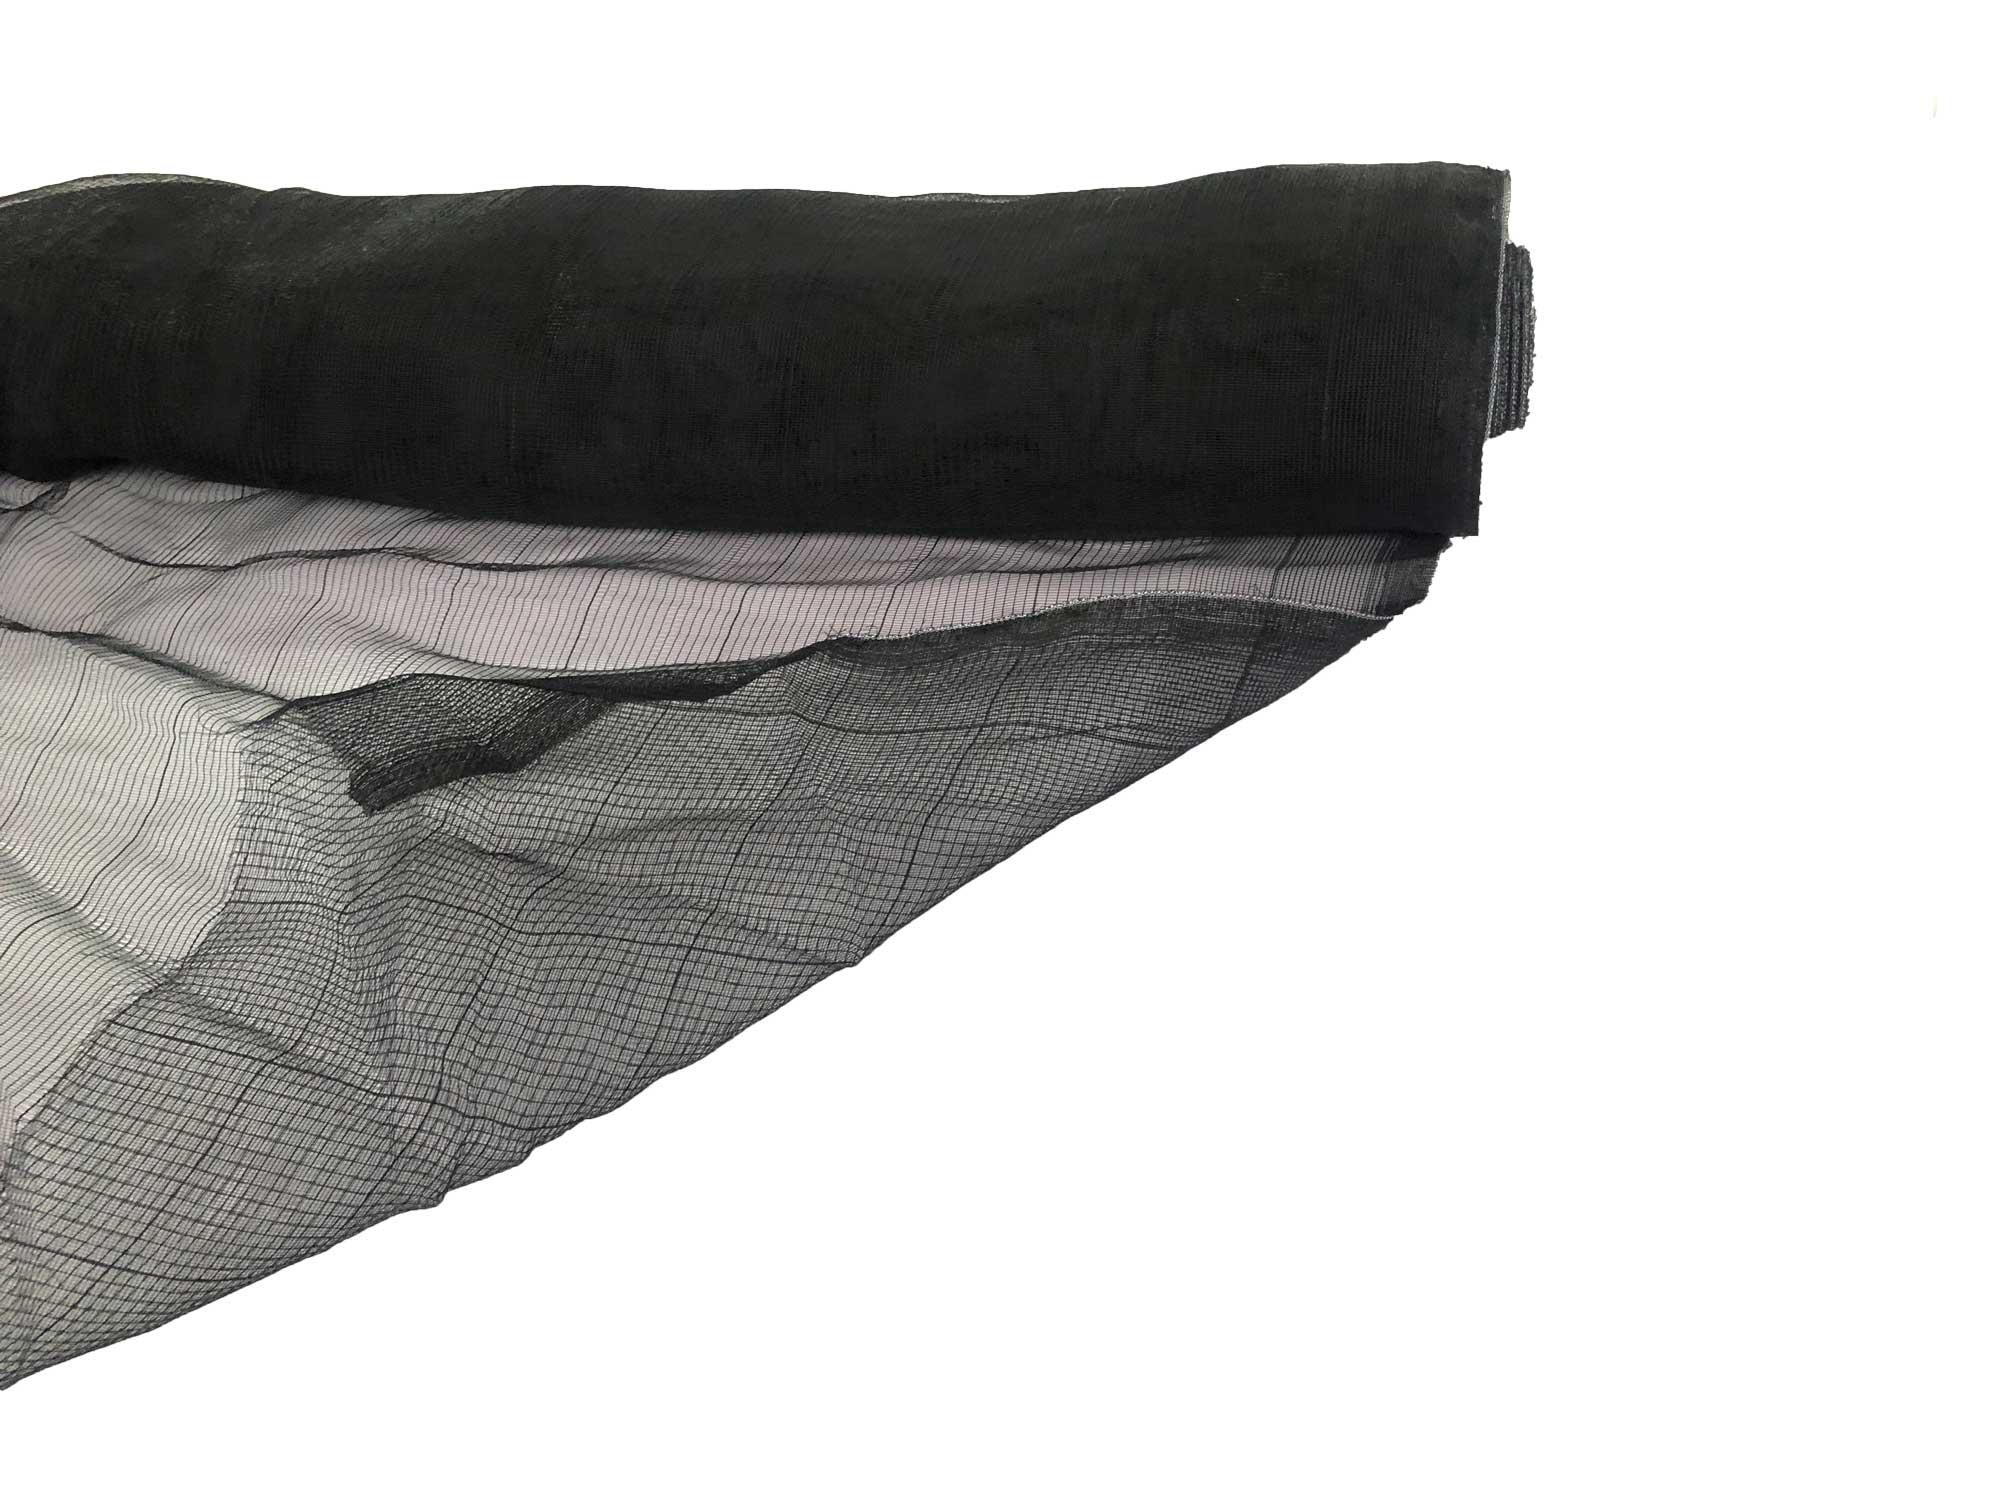 Tela Sombrite Nylon Monofilamento com Giro Inglês 50% 3x10m